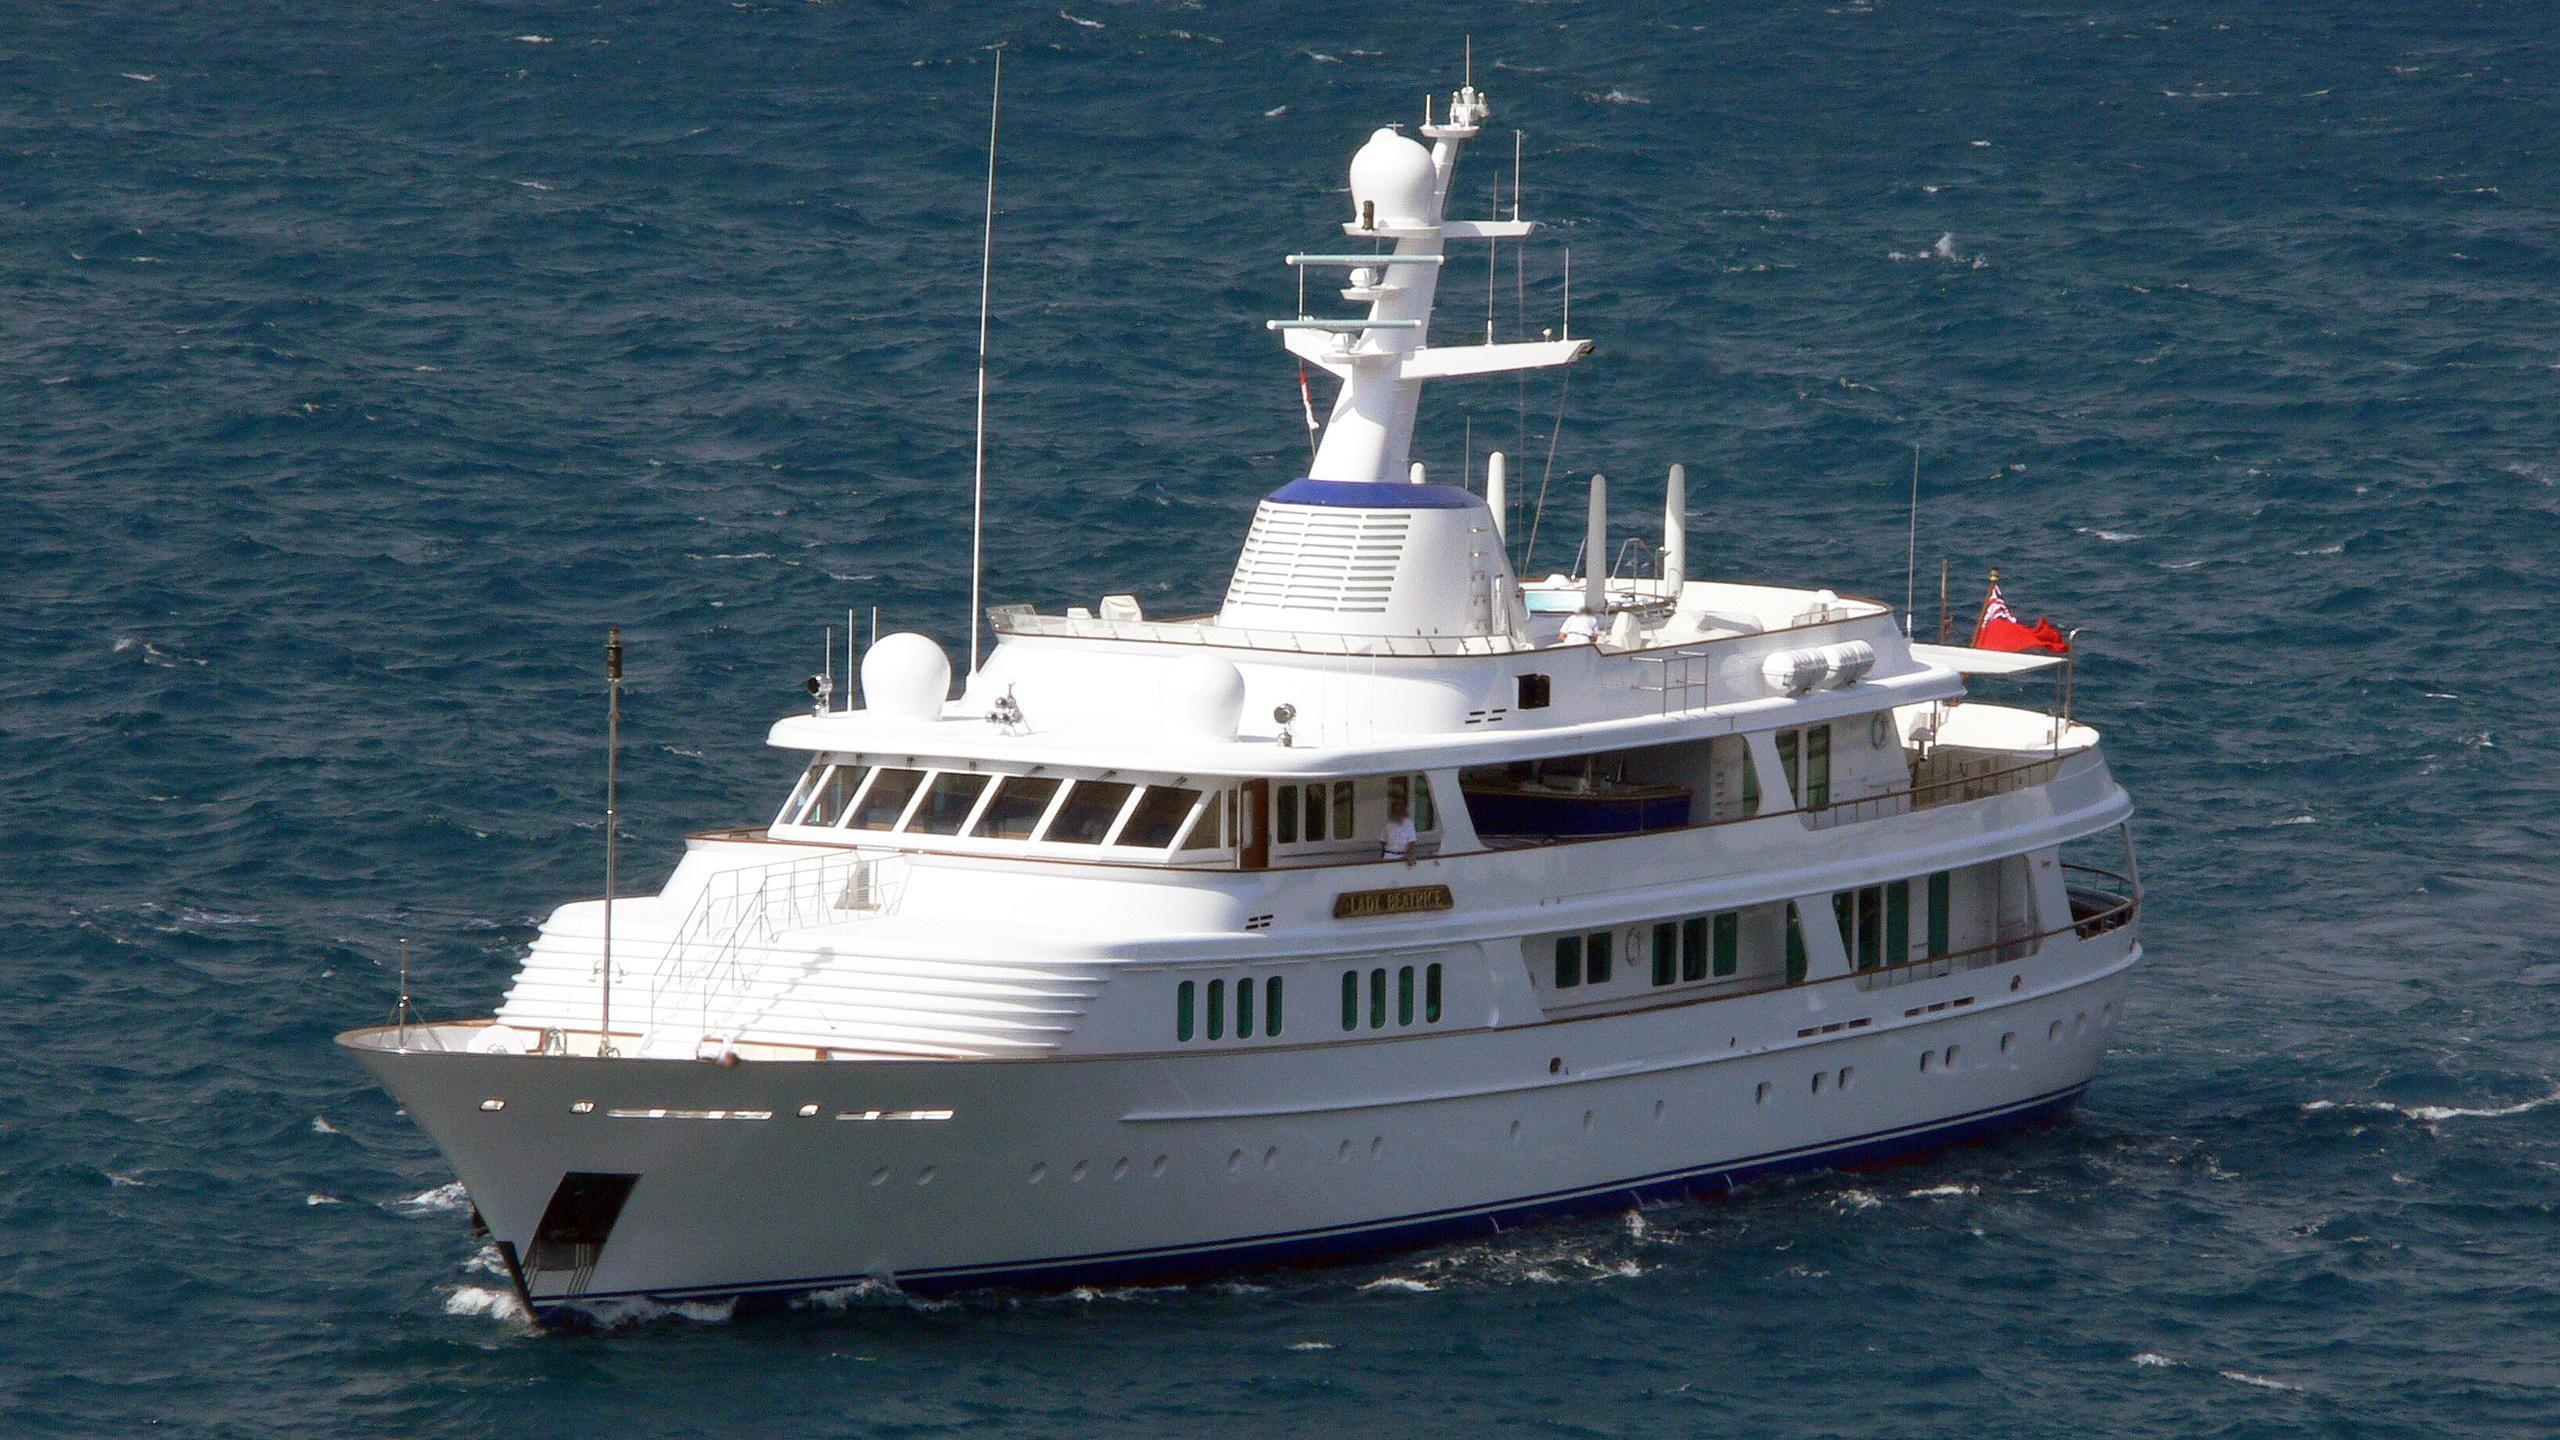 lady-beatrice-motor-yacht-feadship-1993-60m-cruising-half-profile